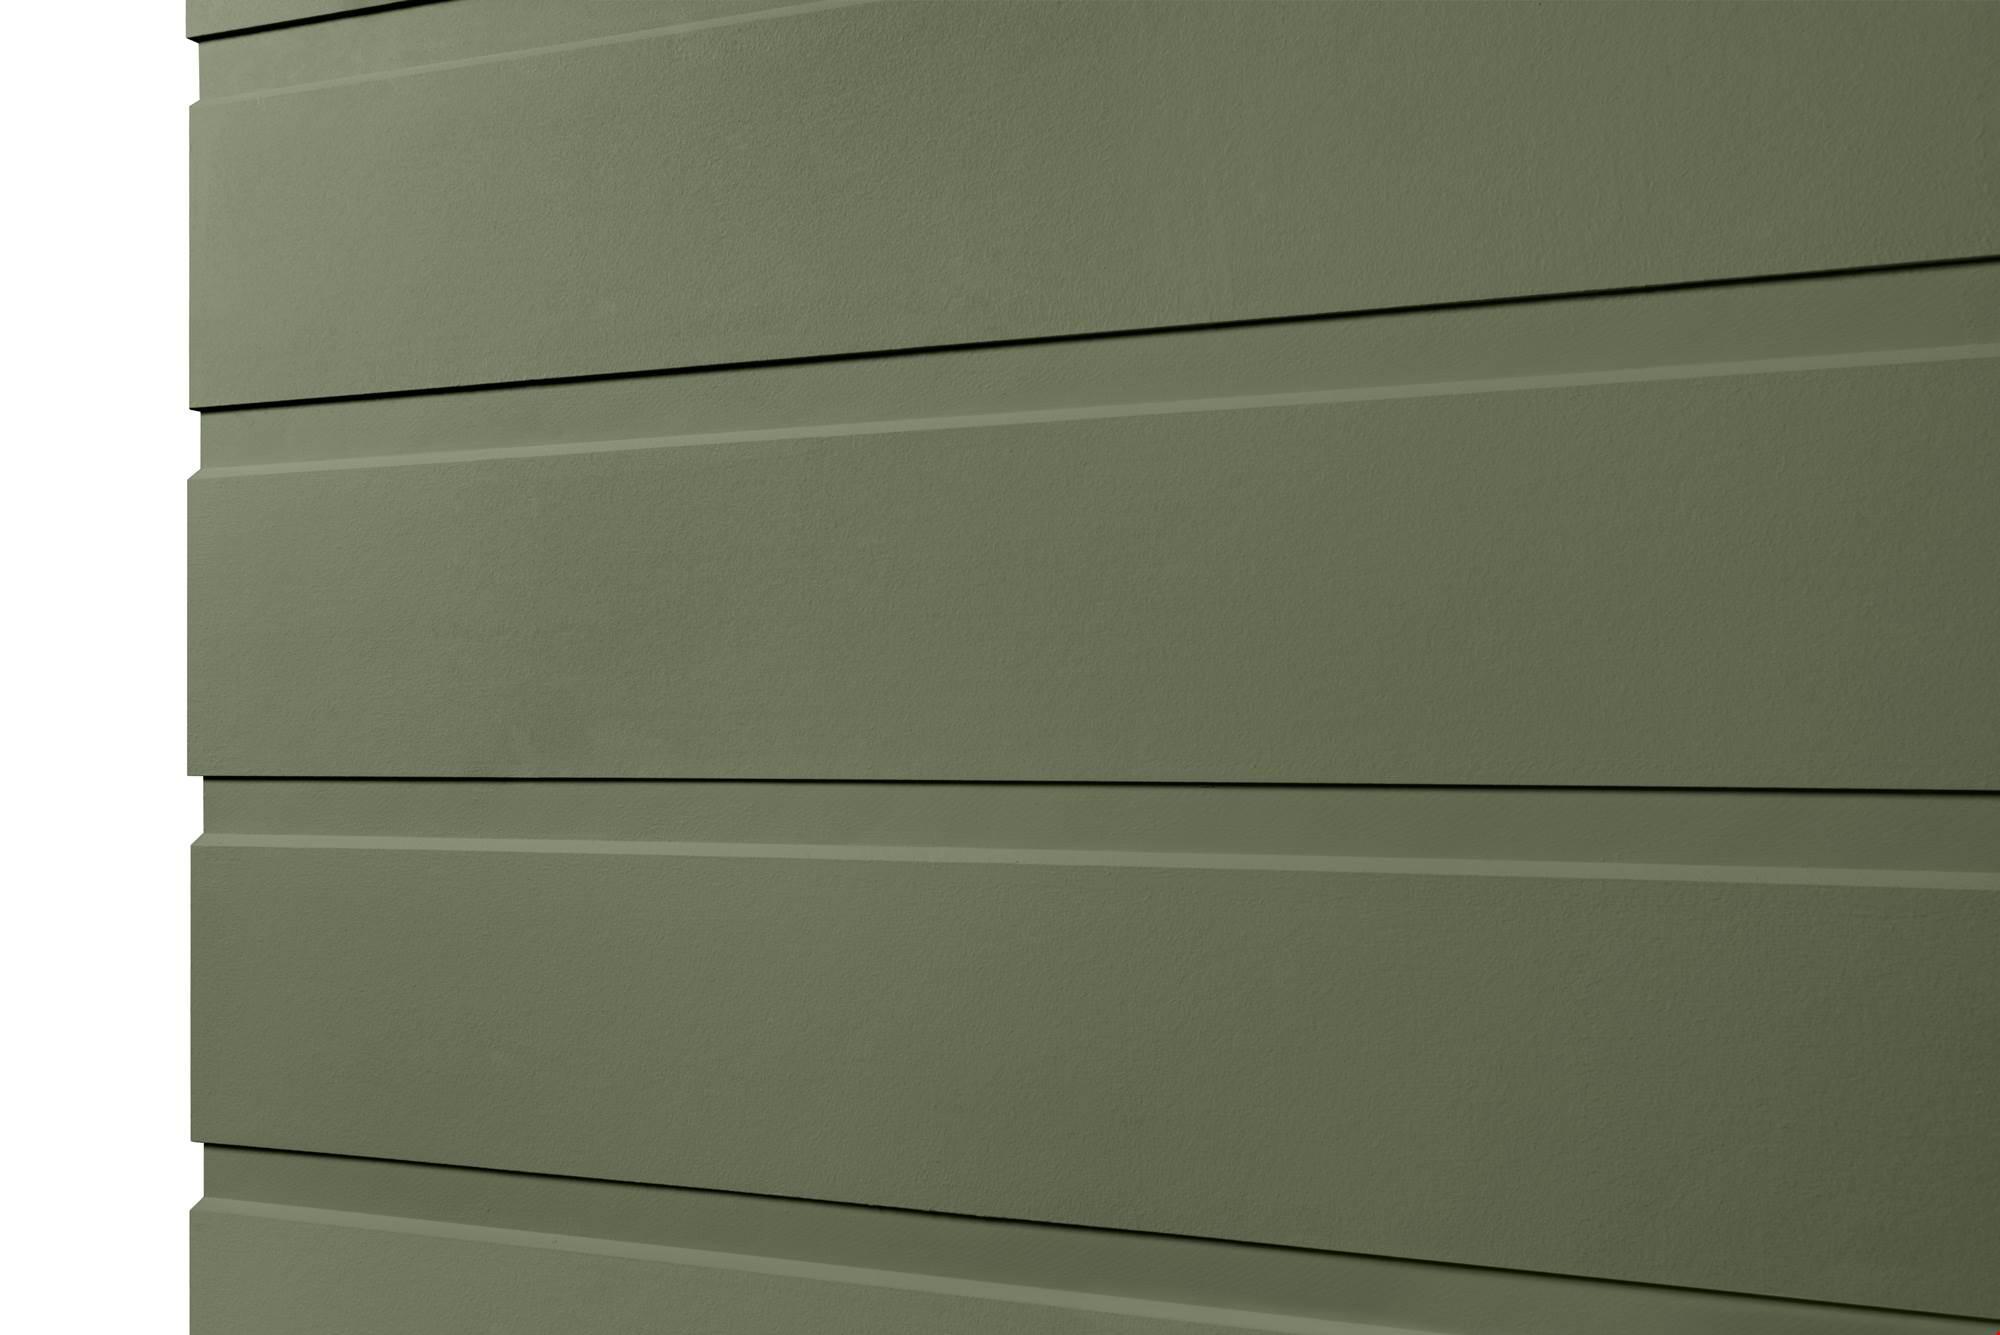 Artisan Bevel Channel Siding Scottish Home Improvements